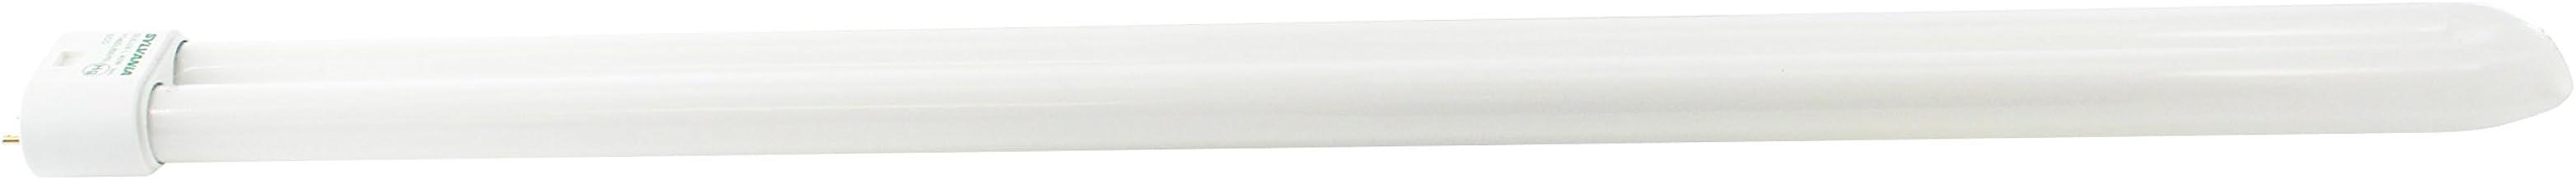 Osram 20584 Sylvania 20584-FT40DL/830/RS/ECO-40 Watt CFL Light Bulb-Compact Fluorescent-4 Pin 2G11 Base-3000K